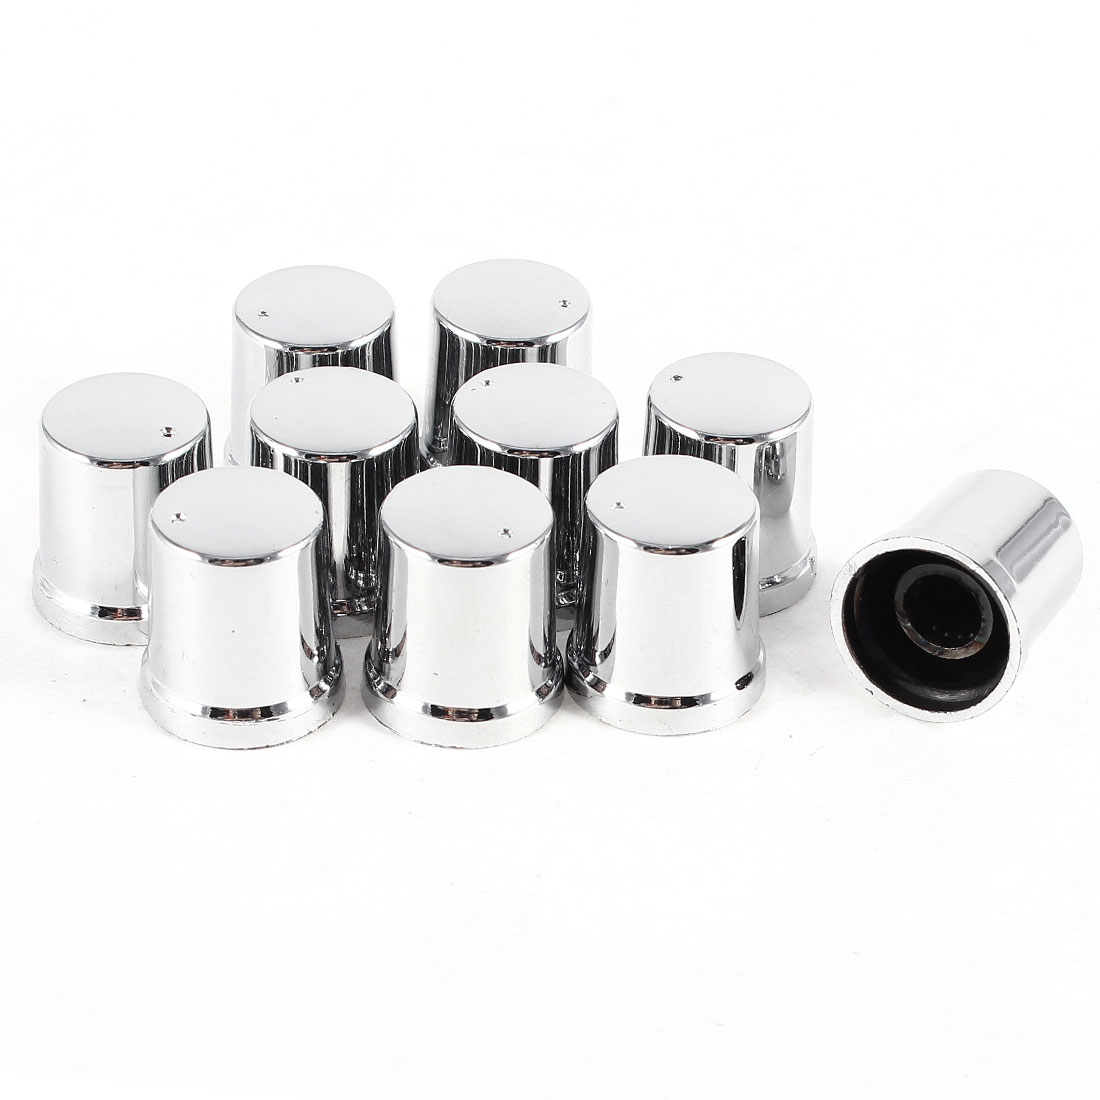 17mm x 15mm Plastic Potentiometer Control Volume Rotary Knob Cap 10 Pcs